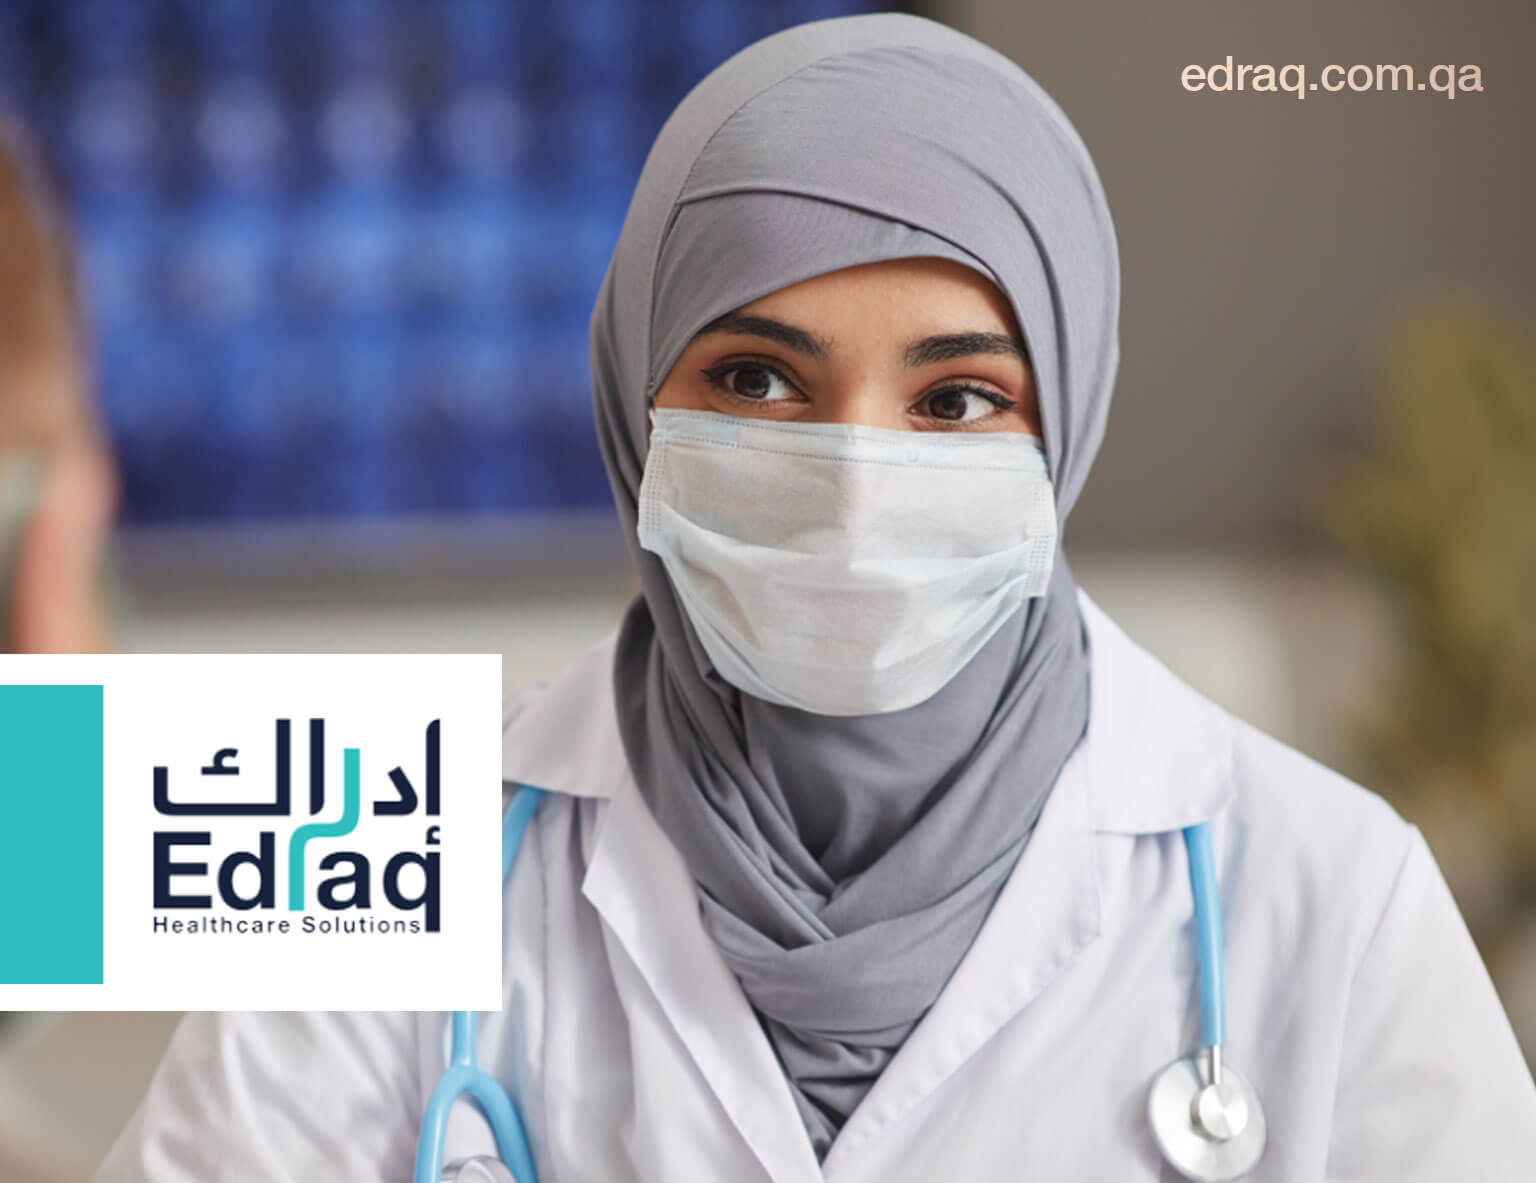 Edraq